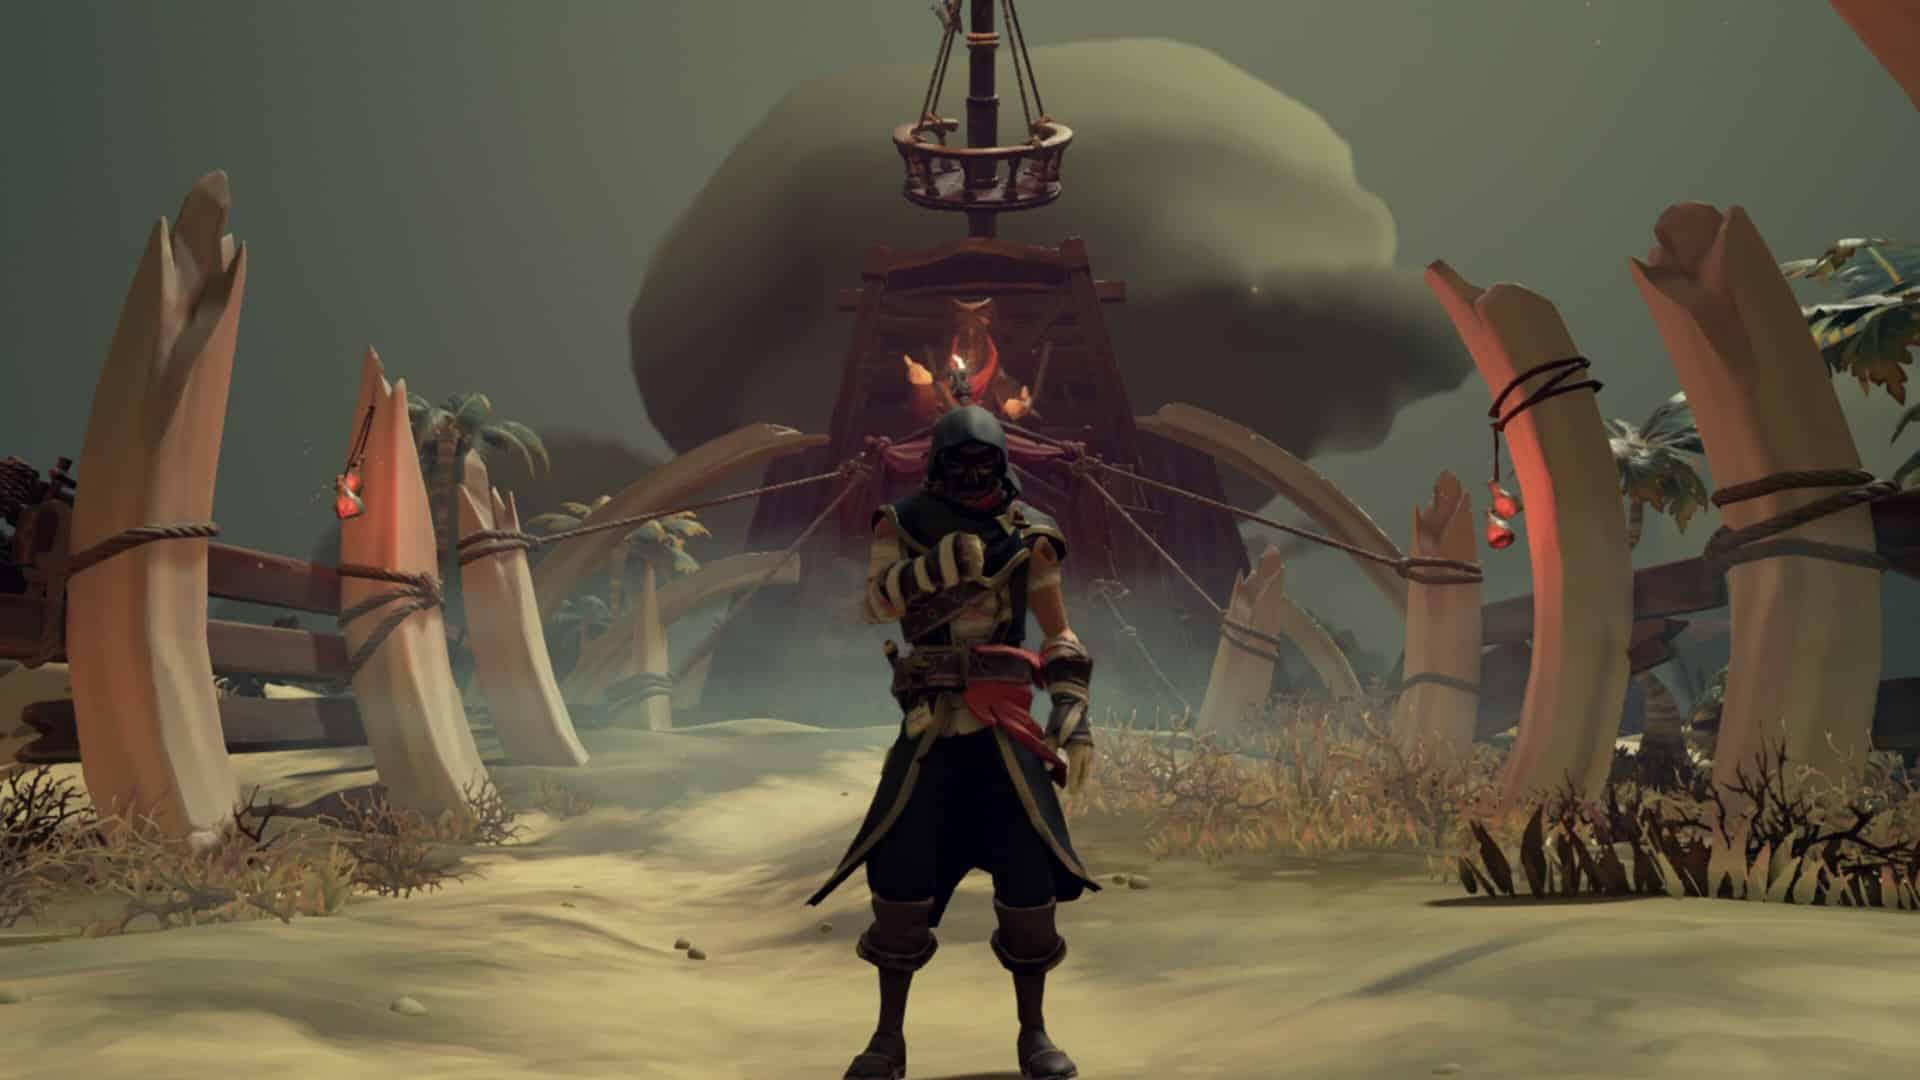 Sea of Thieves Emissary company Reaper's Bones